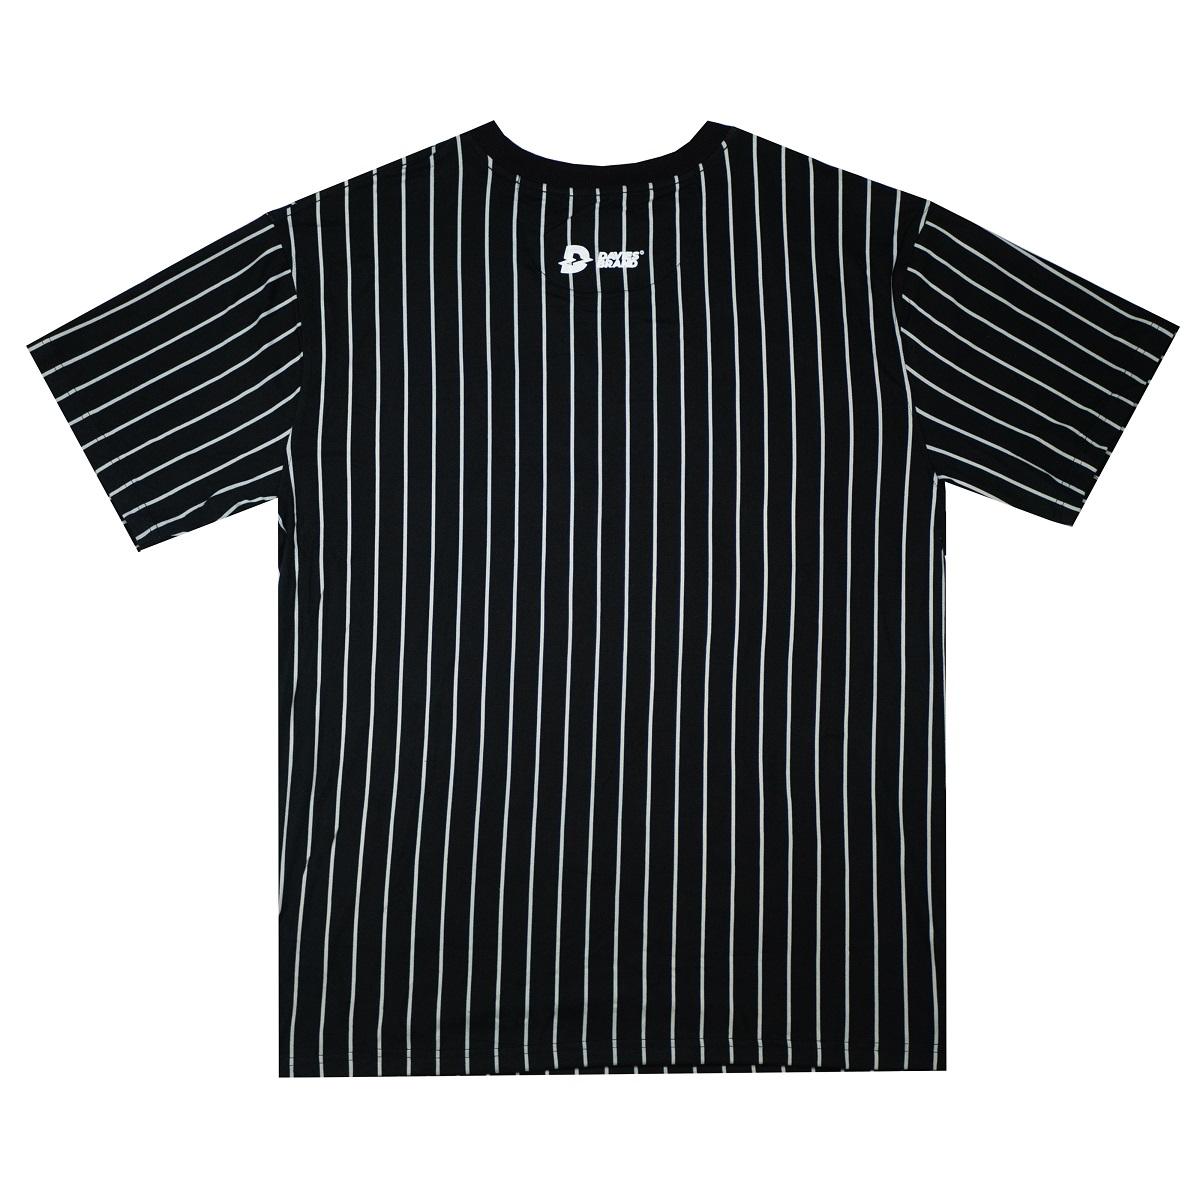 DSW Tee Striped Oversize